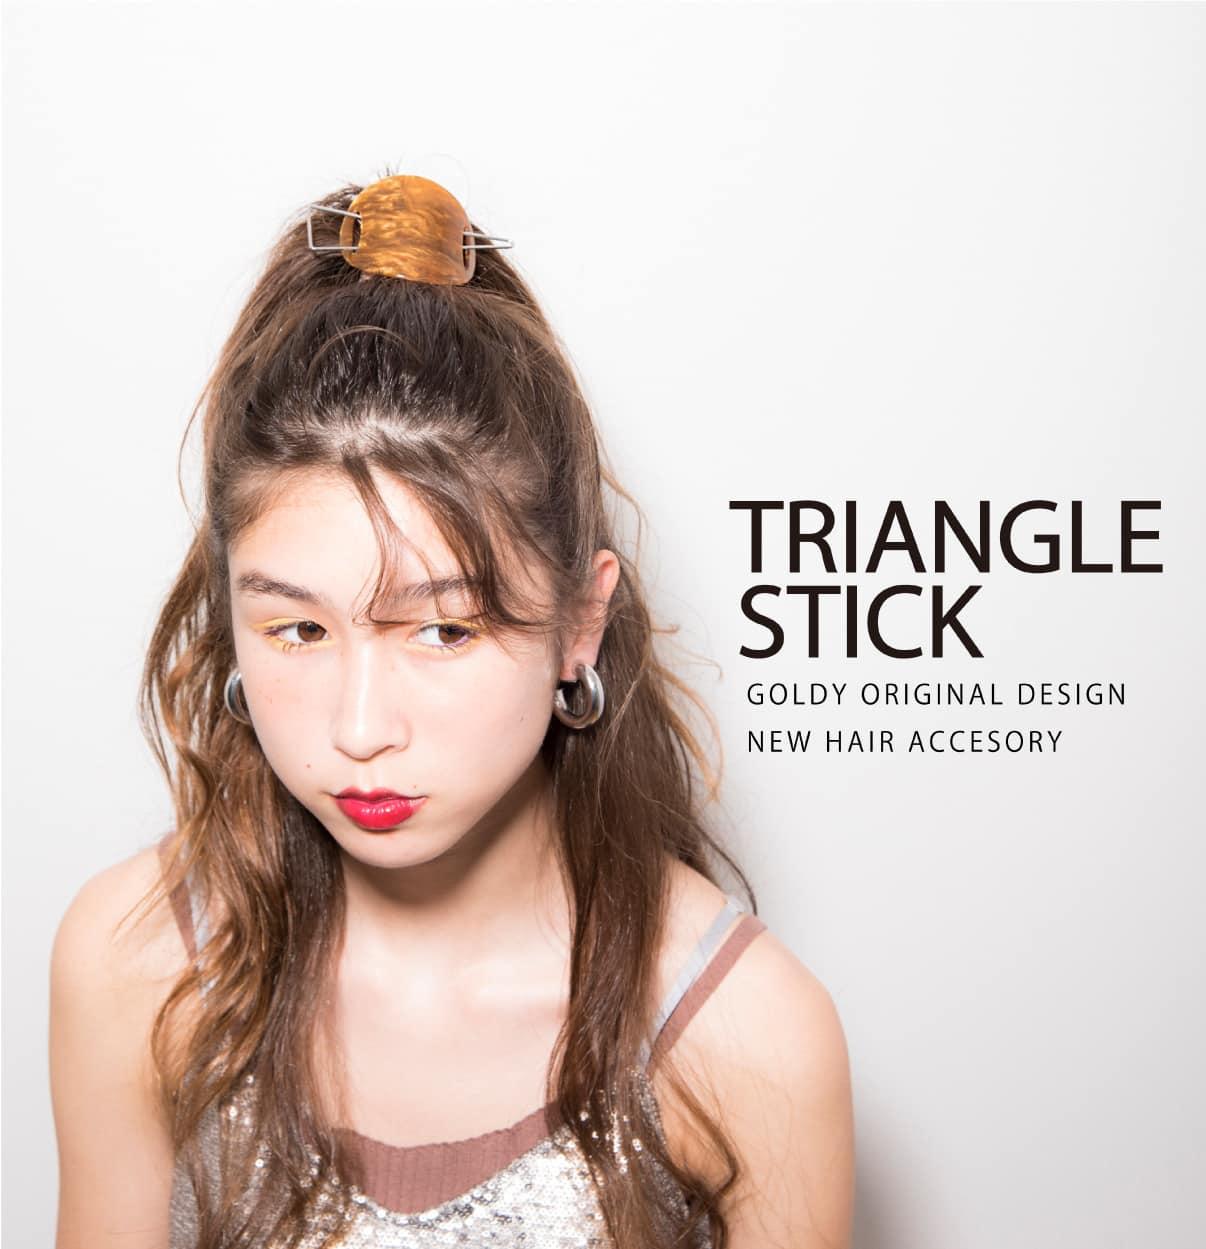 Triangle Stick Goldy Original Design New Hair Accesory